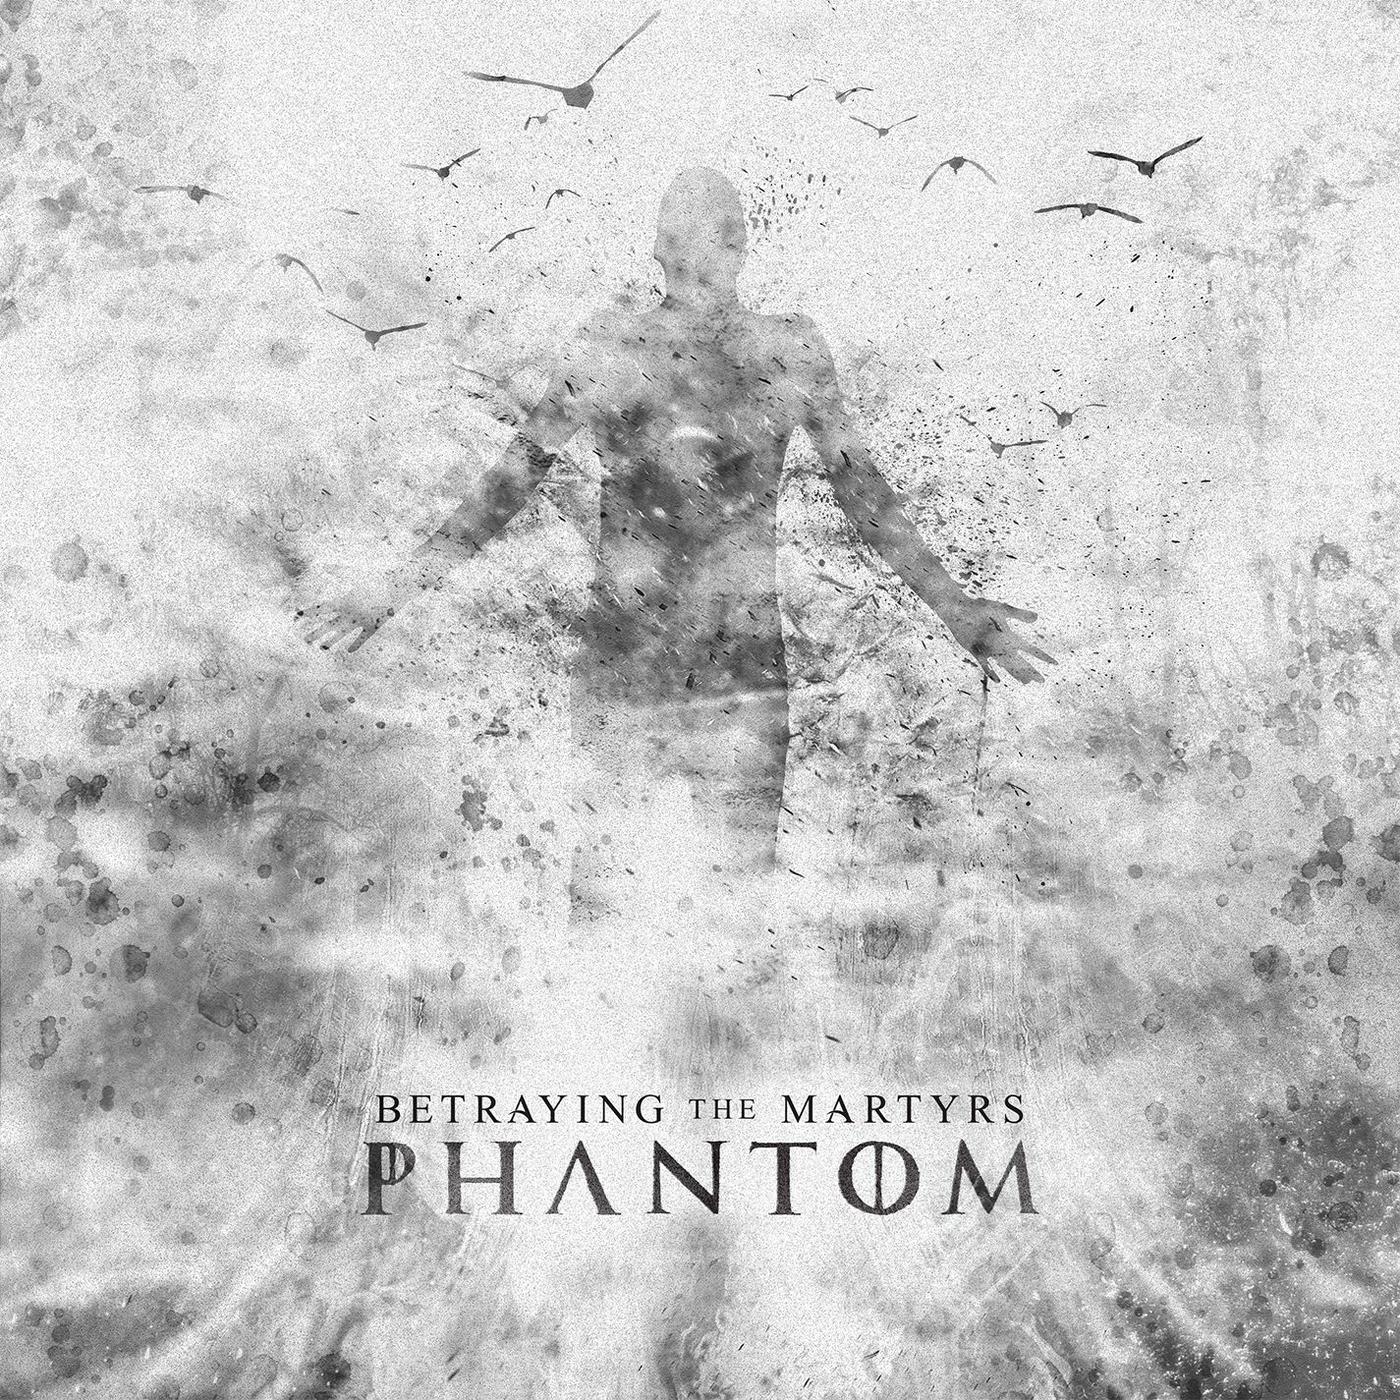 Betraying the Martyrs - Phantom (2014)